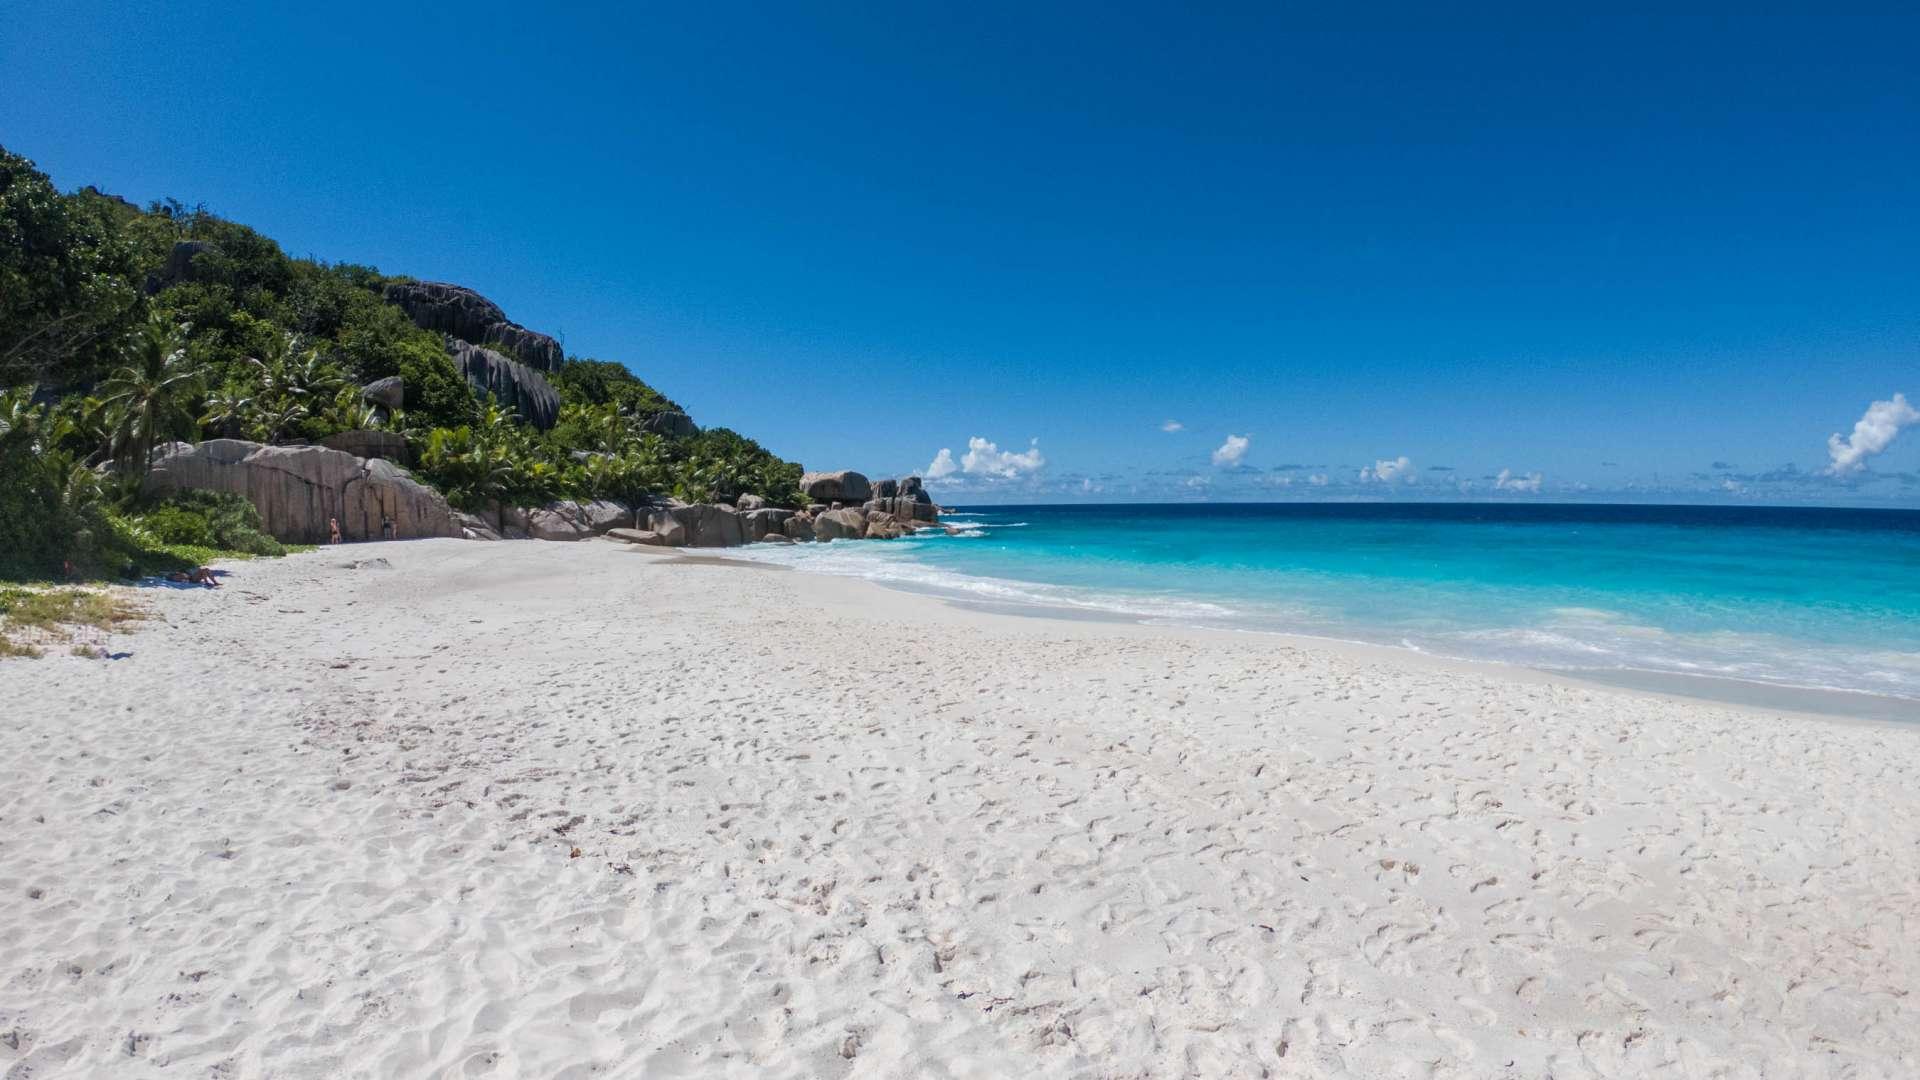 Big sister grande soeur island Seychelles travel photography underwater snorkeling enrico pescantini